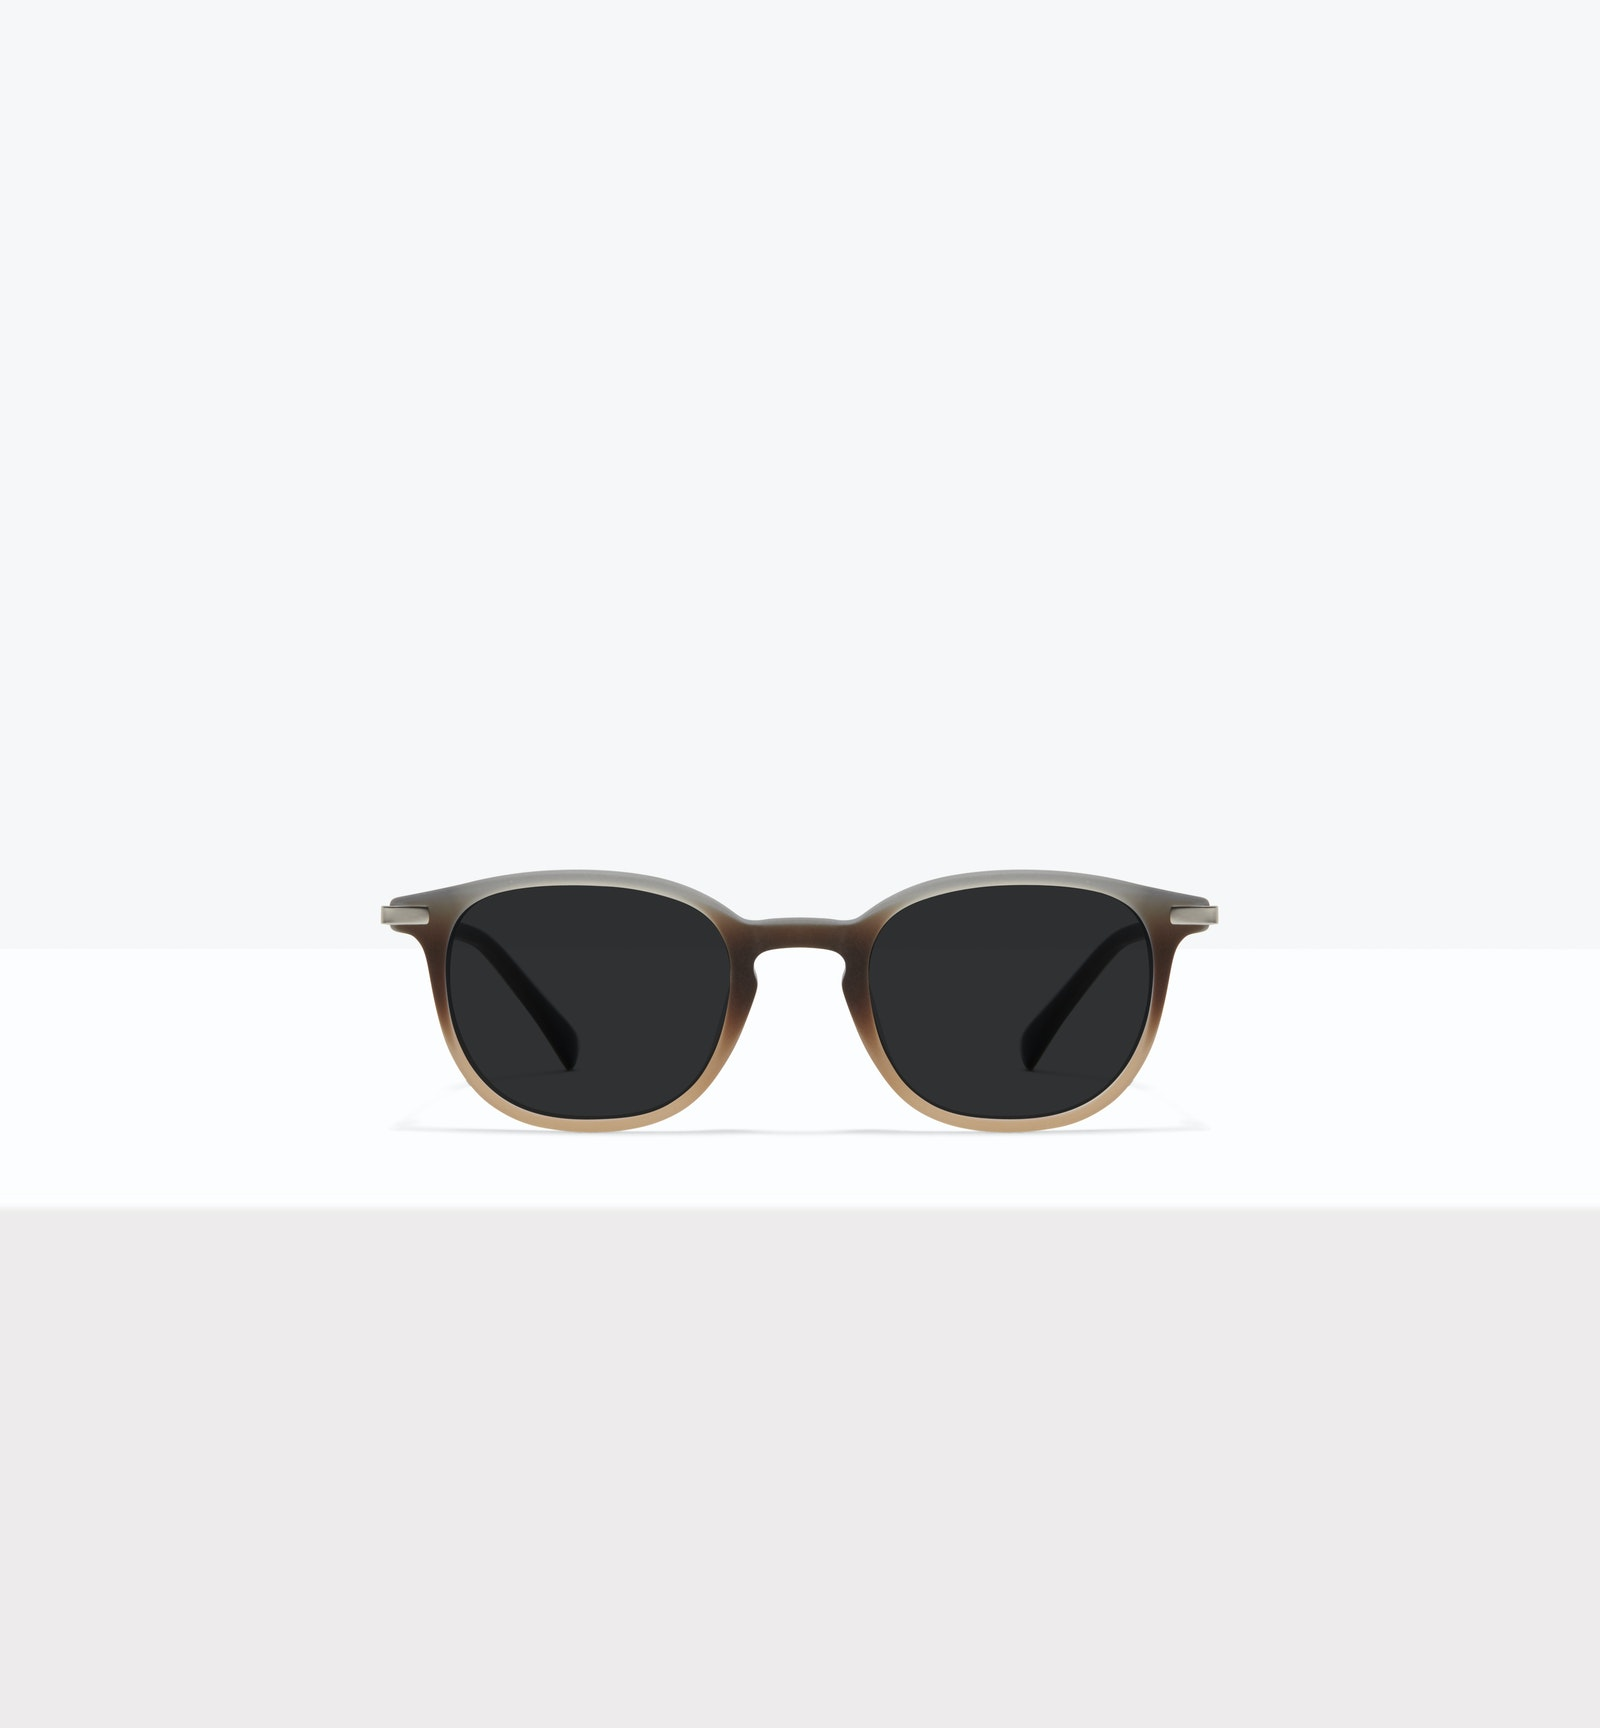 Affordable Fashion Glasses Round Sunglasses Men Tux M Matte Fog